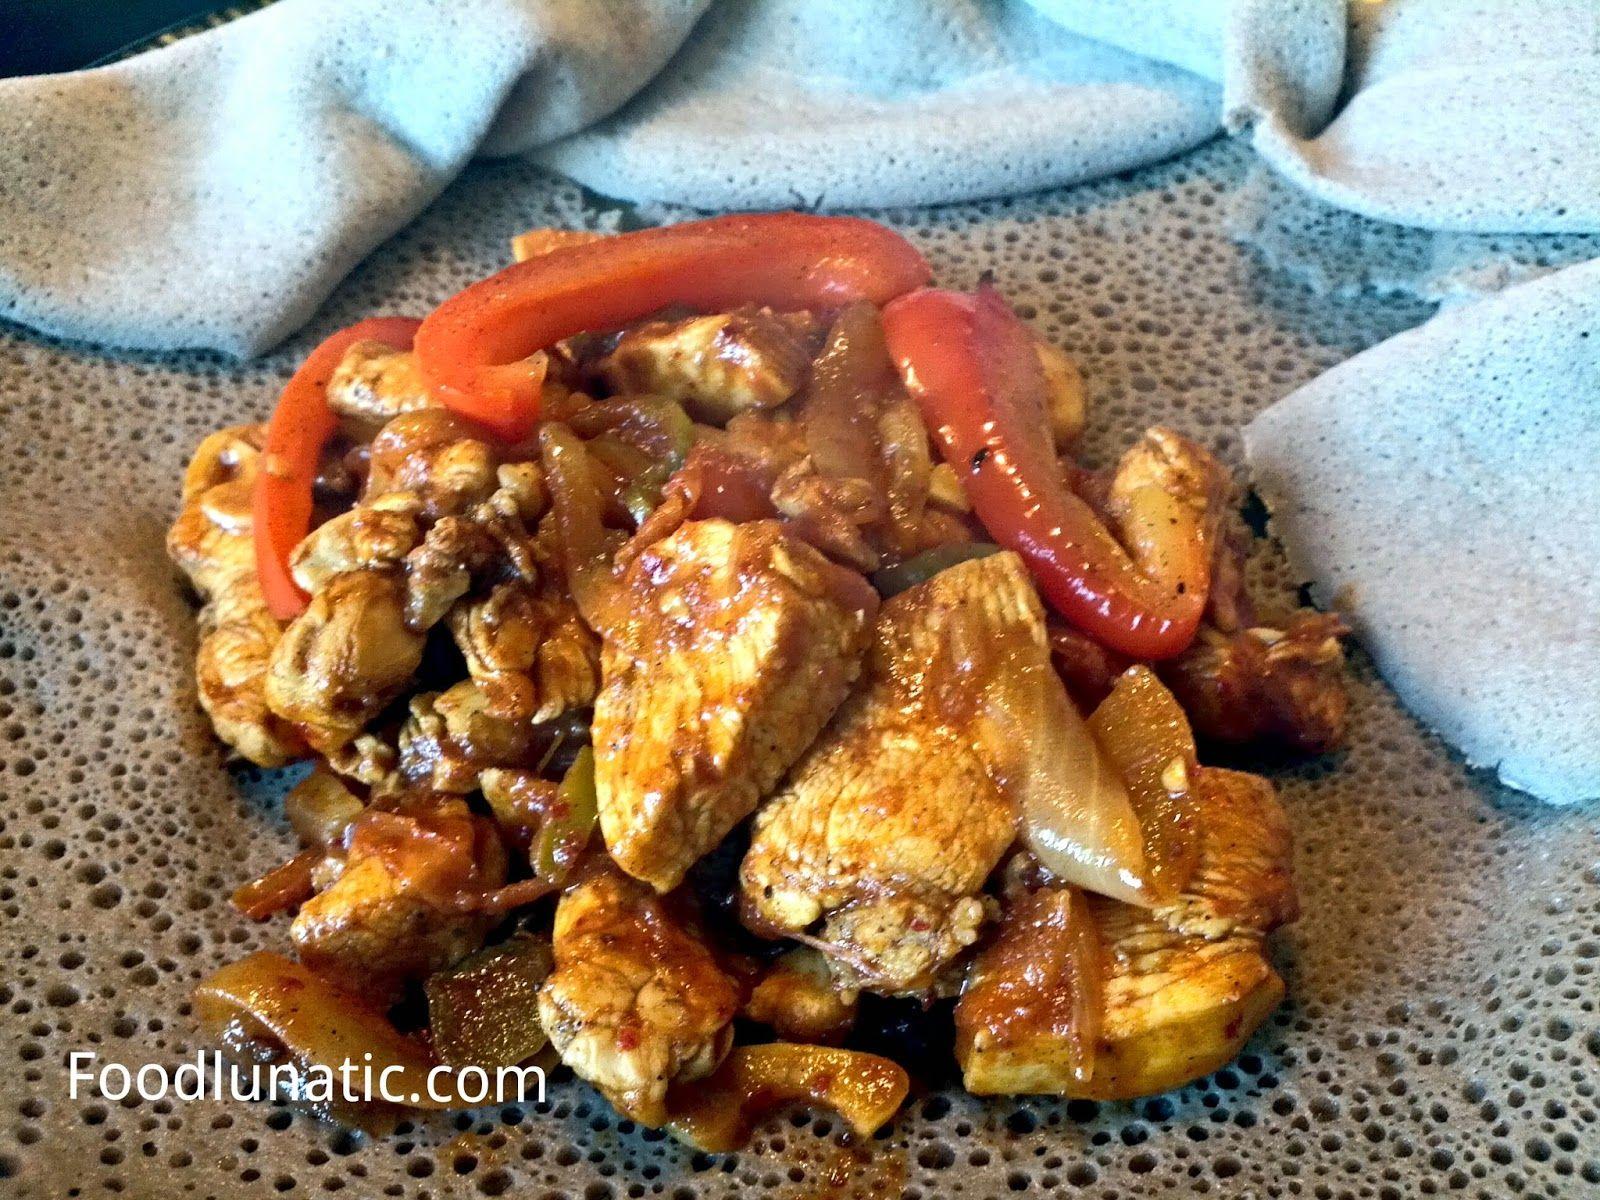 Doro awaze tibs ethiopian sauted chicken with awaze chili sauce doro awaze tibs ethiopian sauted chicken with awaze chili sauce tried this ethiopian food recipesethiopian forumfinder Choice Image